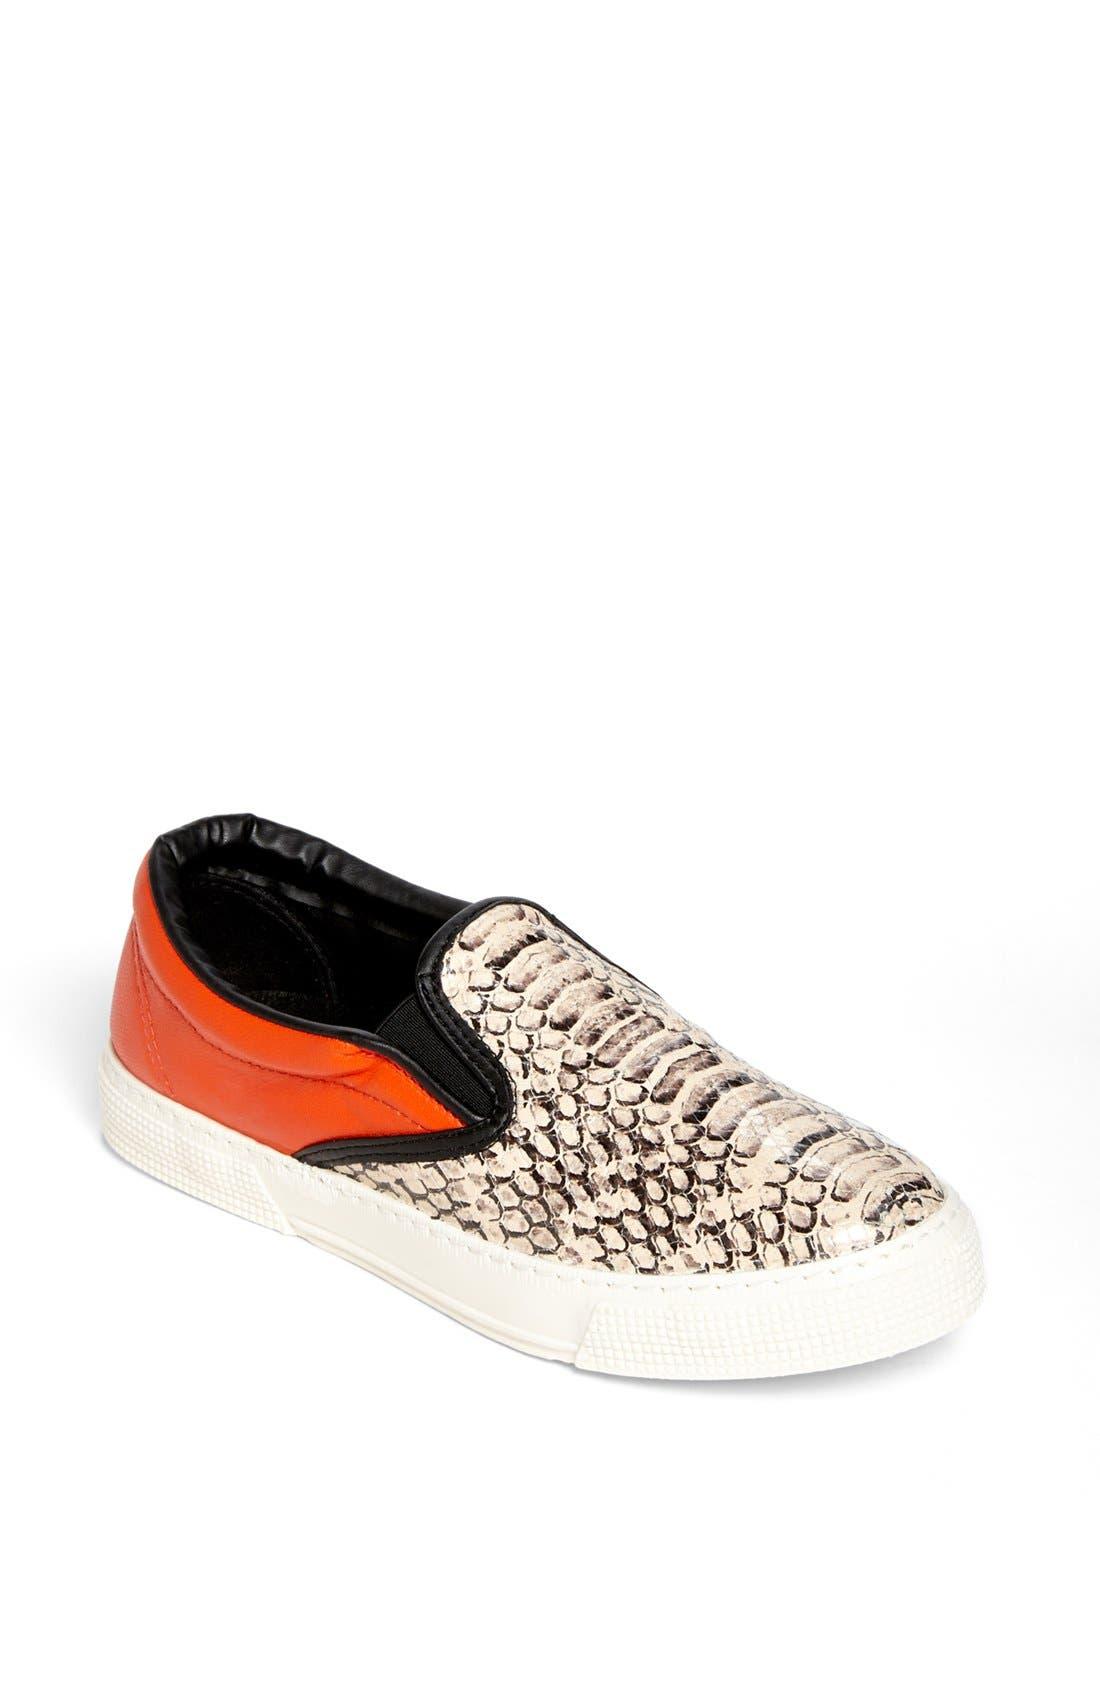 Main Image - Kurt Geiger London Slip-On Sneaker